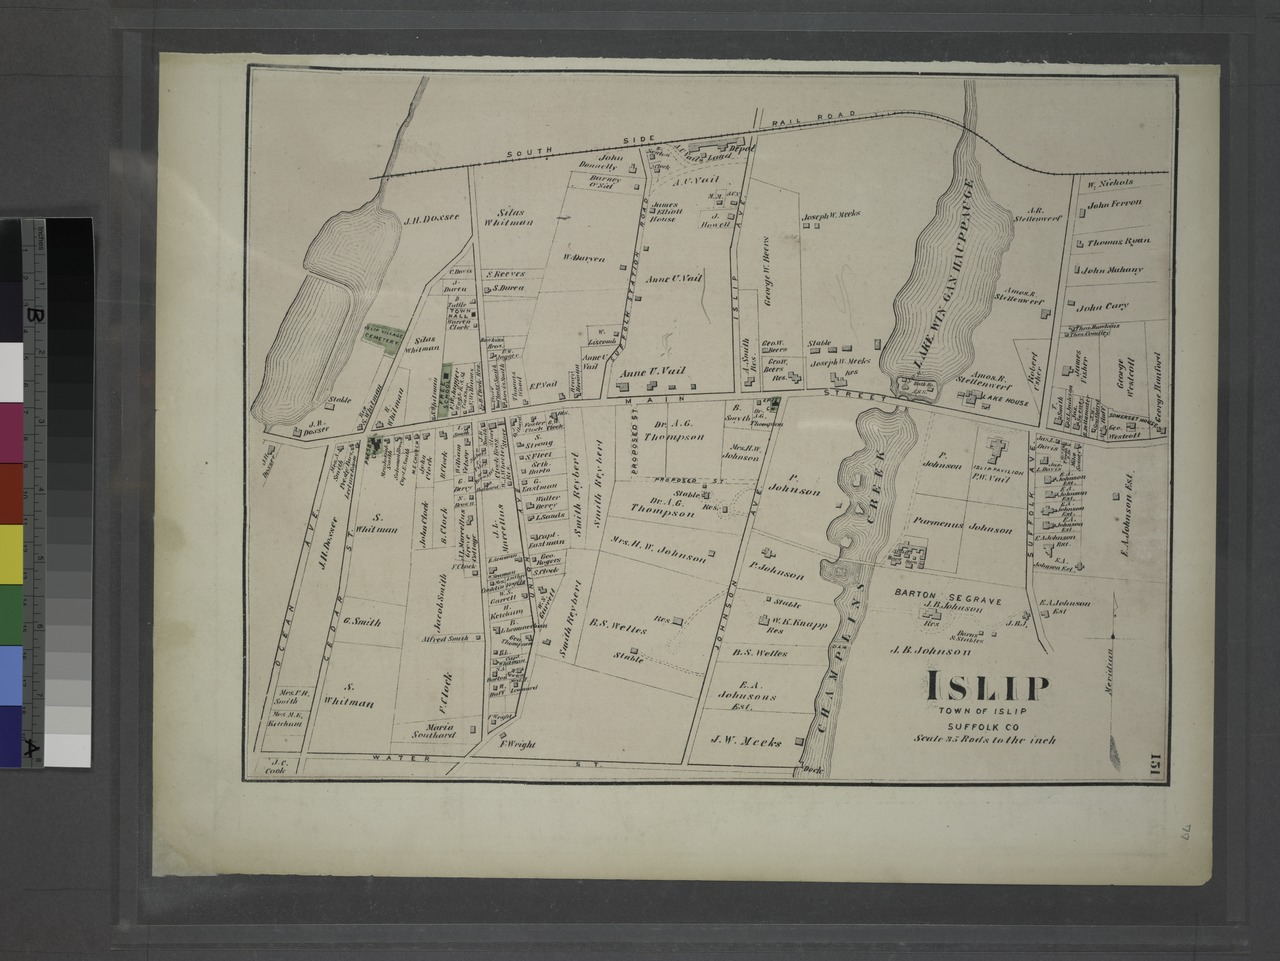 Islip Long Island Map